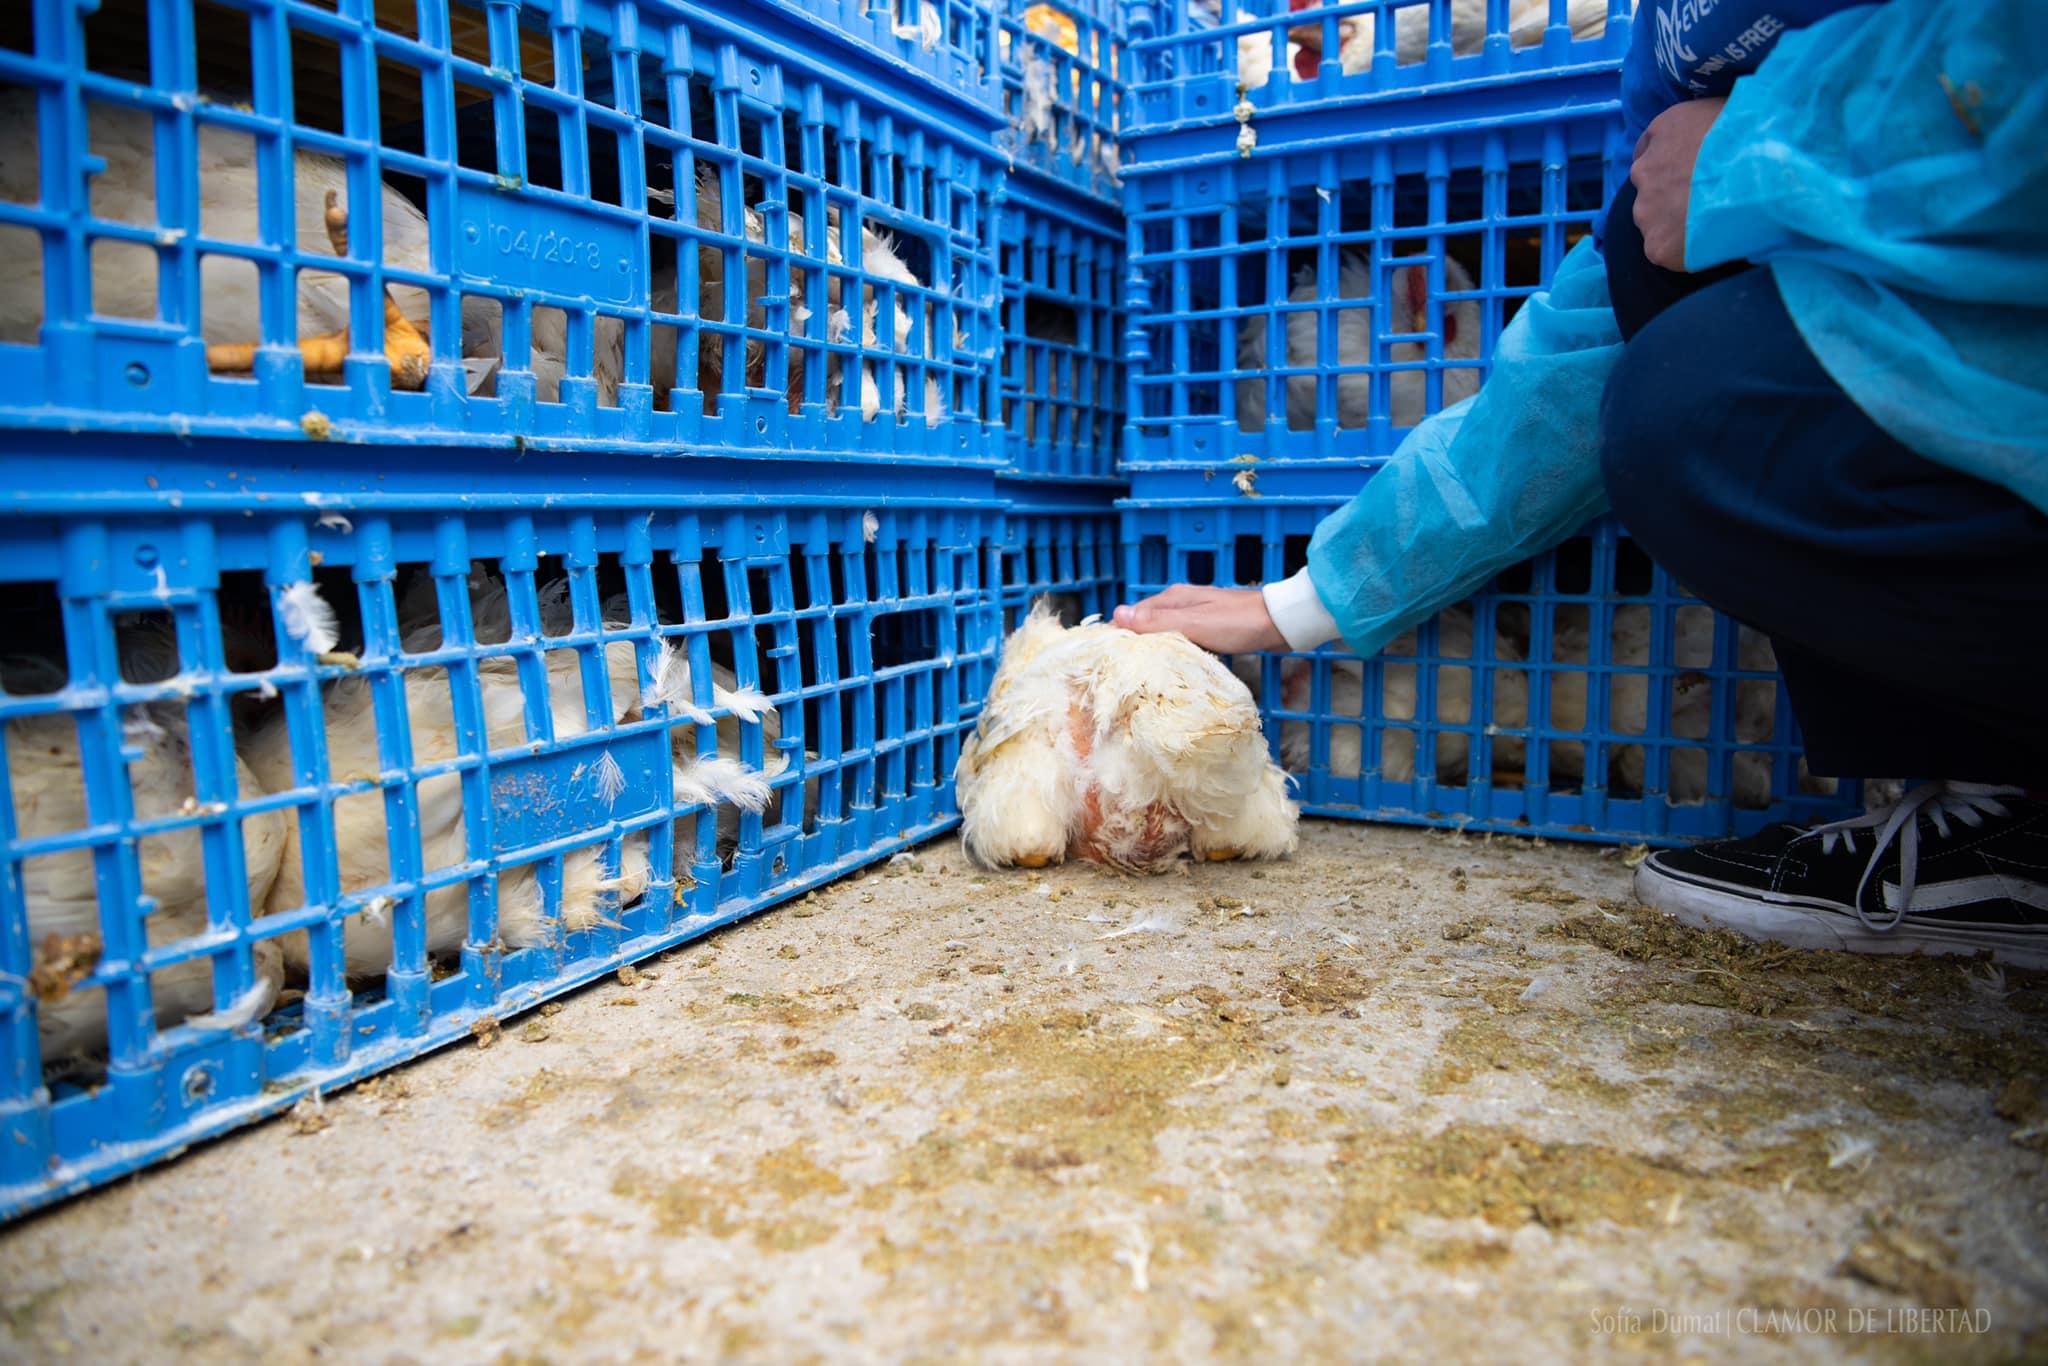 foto Activistas exigen frenar matanza de aves para consumo 27 abril 2019